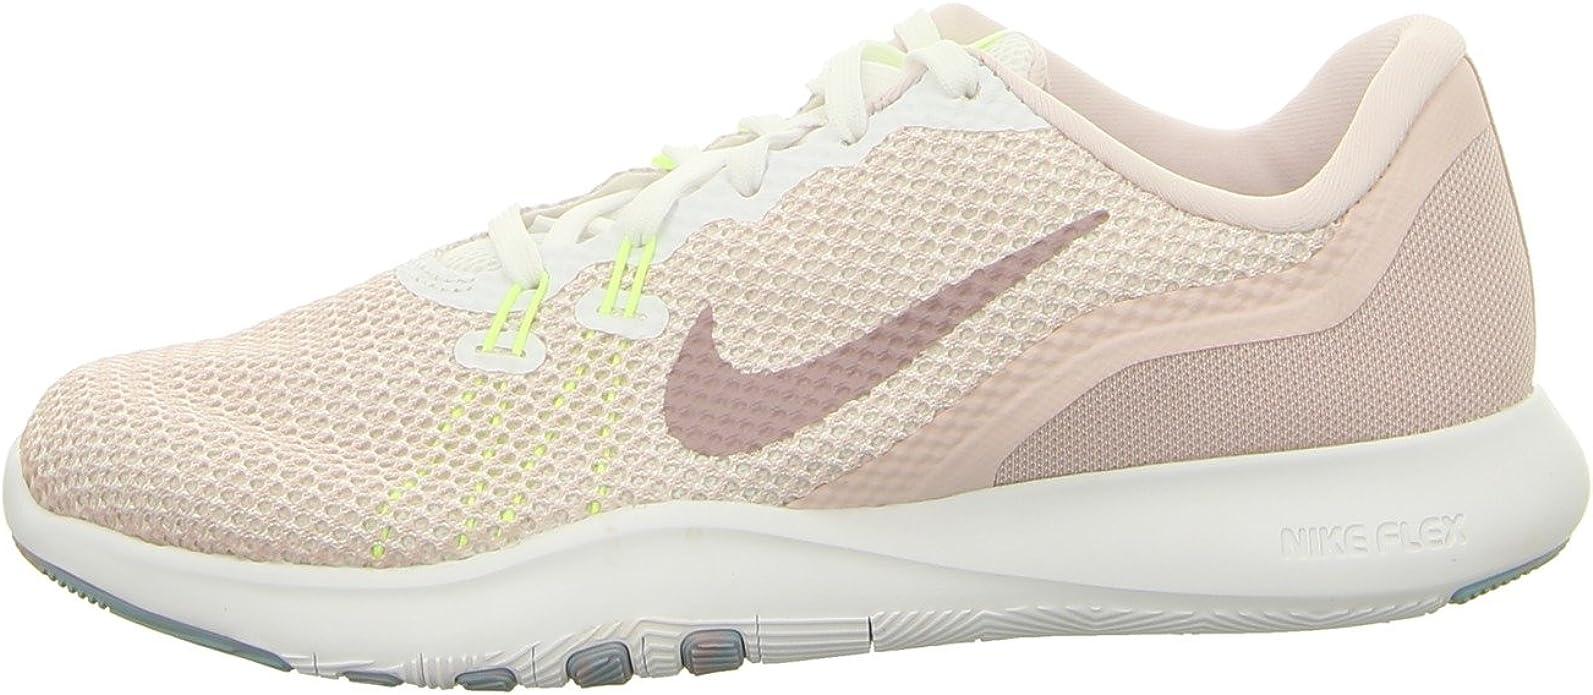 Nike Flex TR 7 White/Elemental Rose